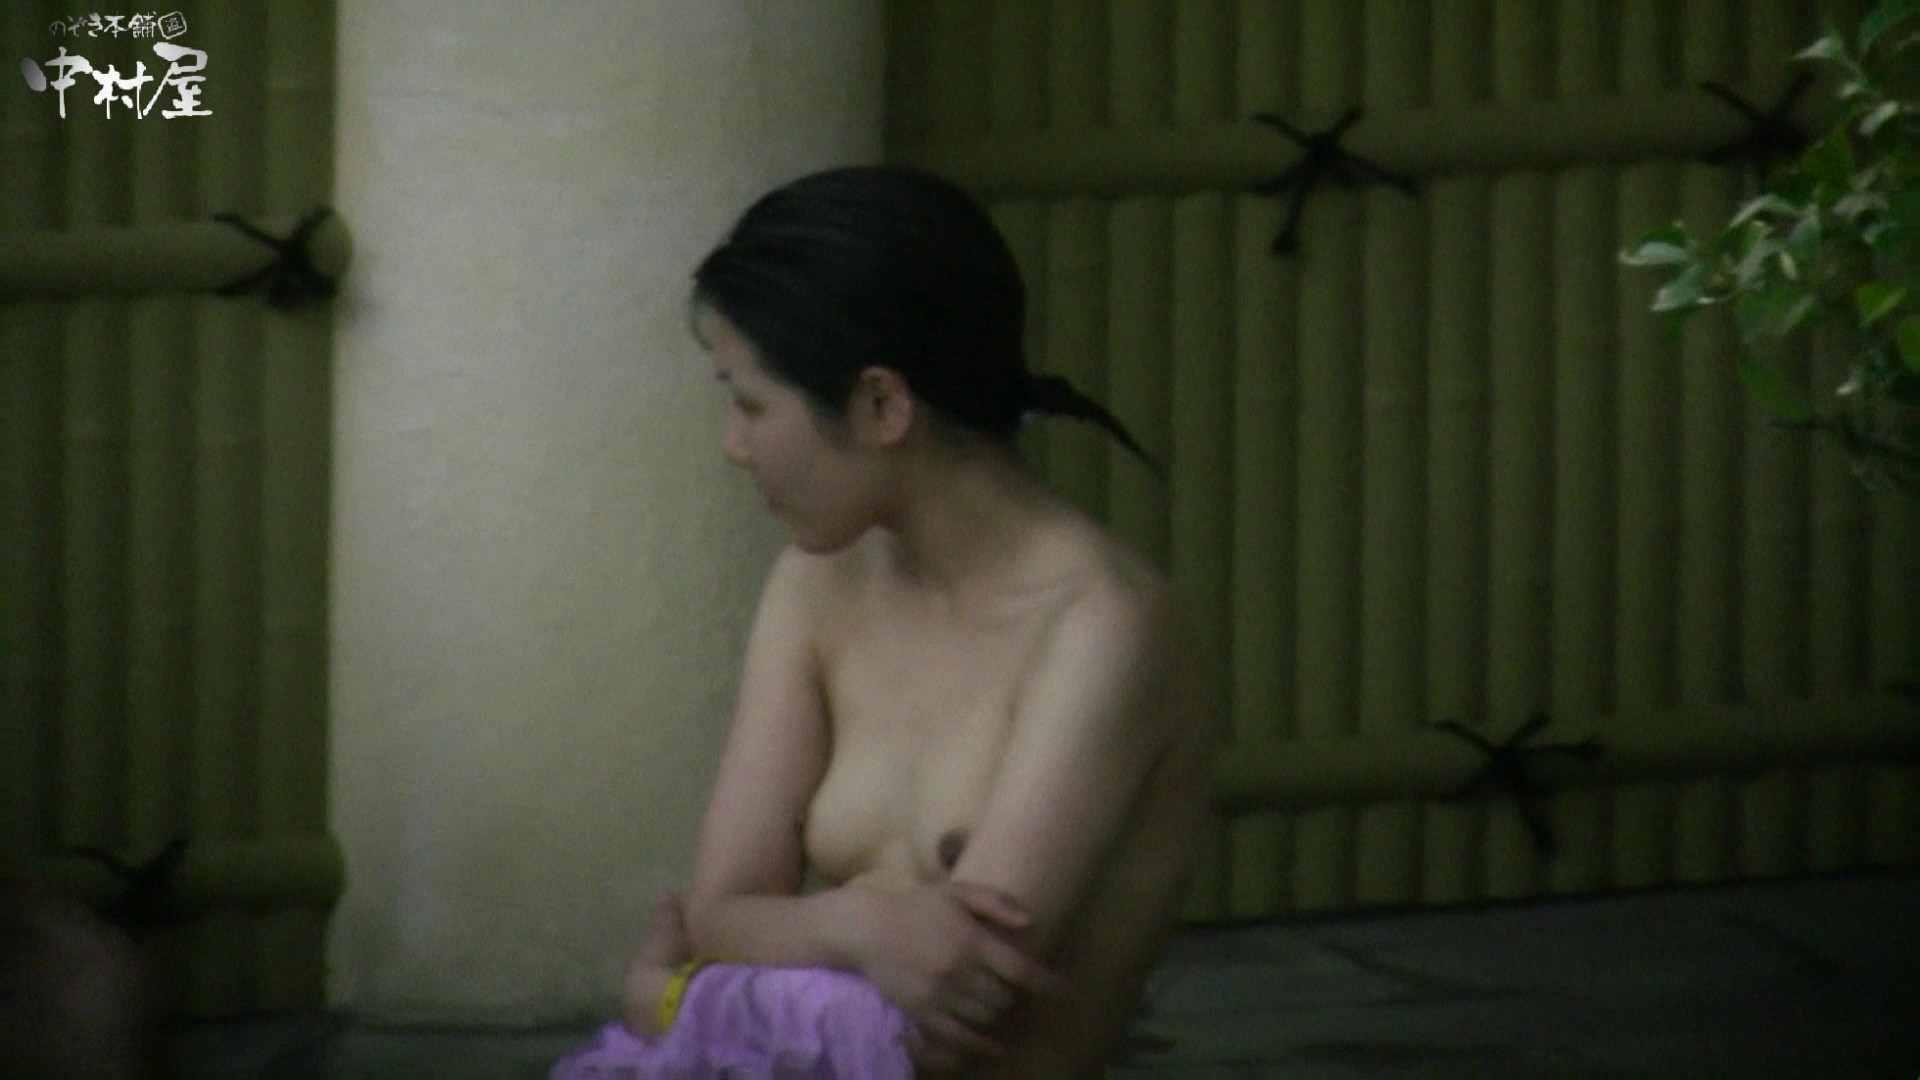 Aquaな露天風呂Vol.983 盗撮  23pic 3